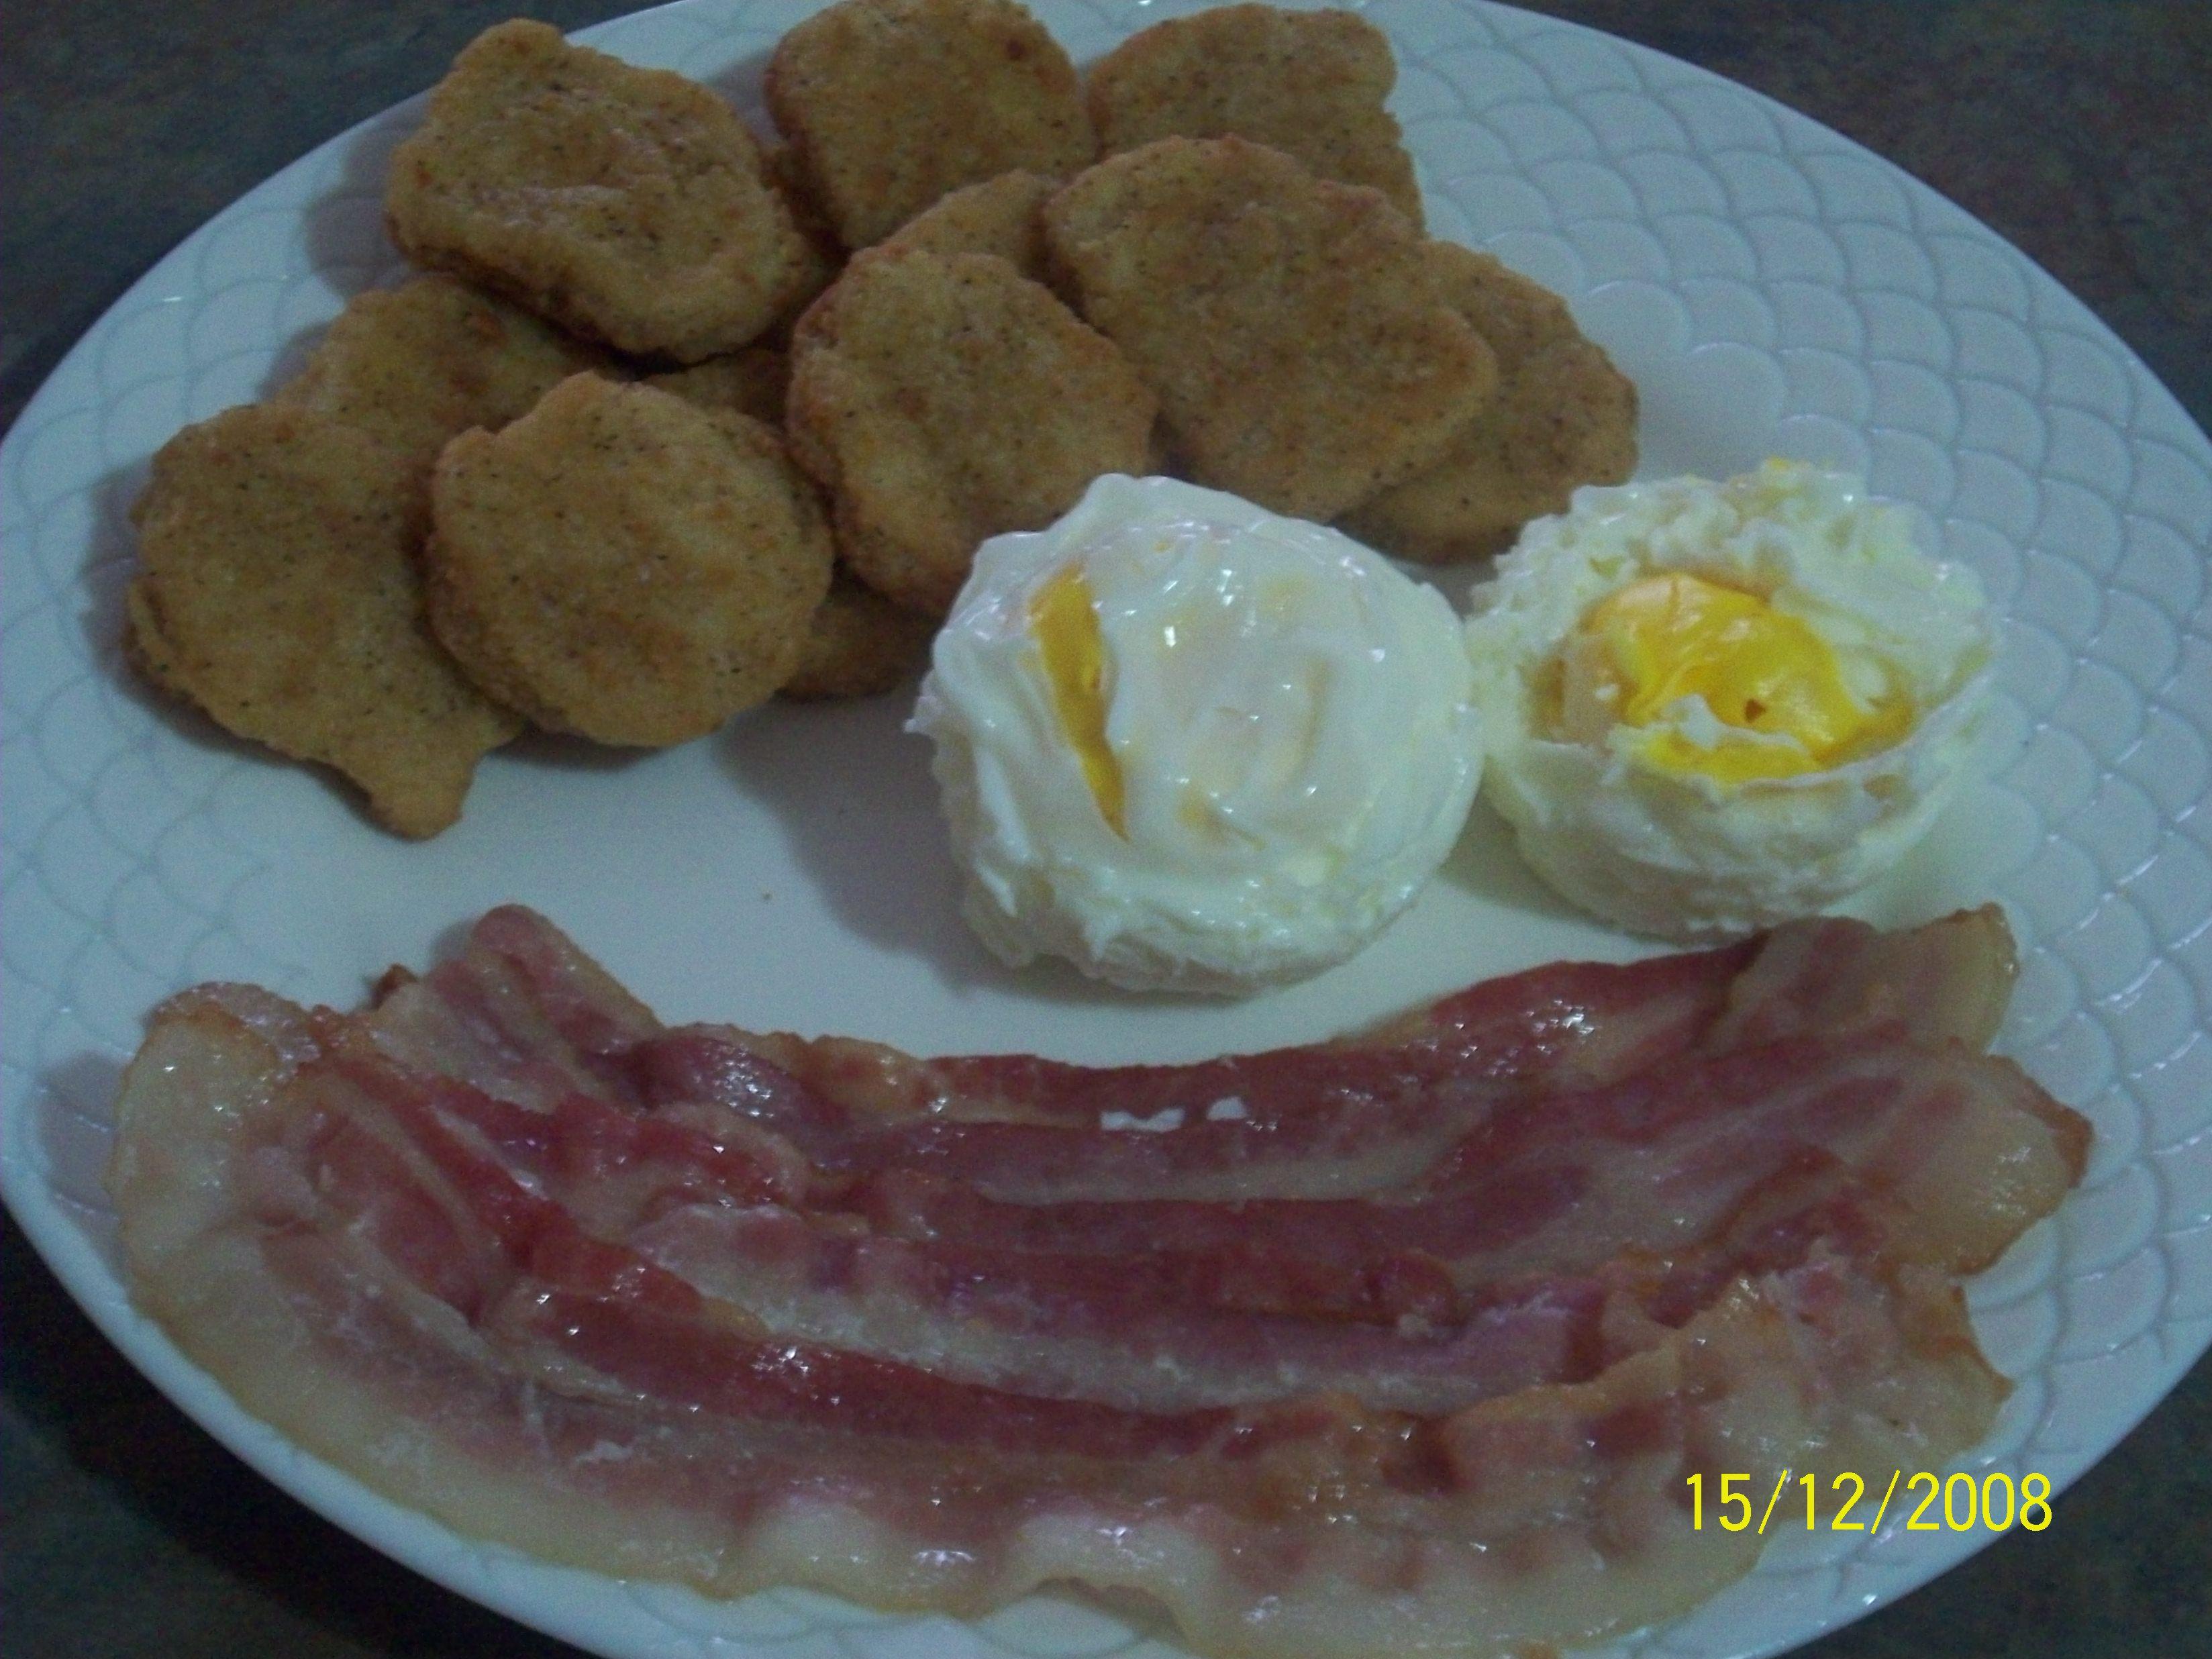 http://foodloader.net/cutie_2008-12-15_Breakfast_Chix_Nuggets_Bacons_and_Eggs.jpg